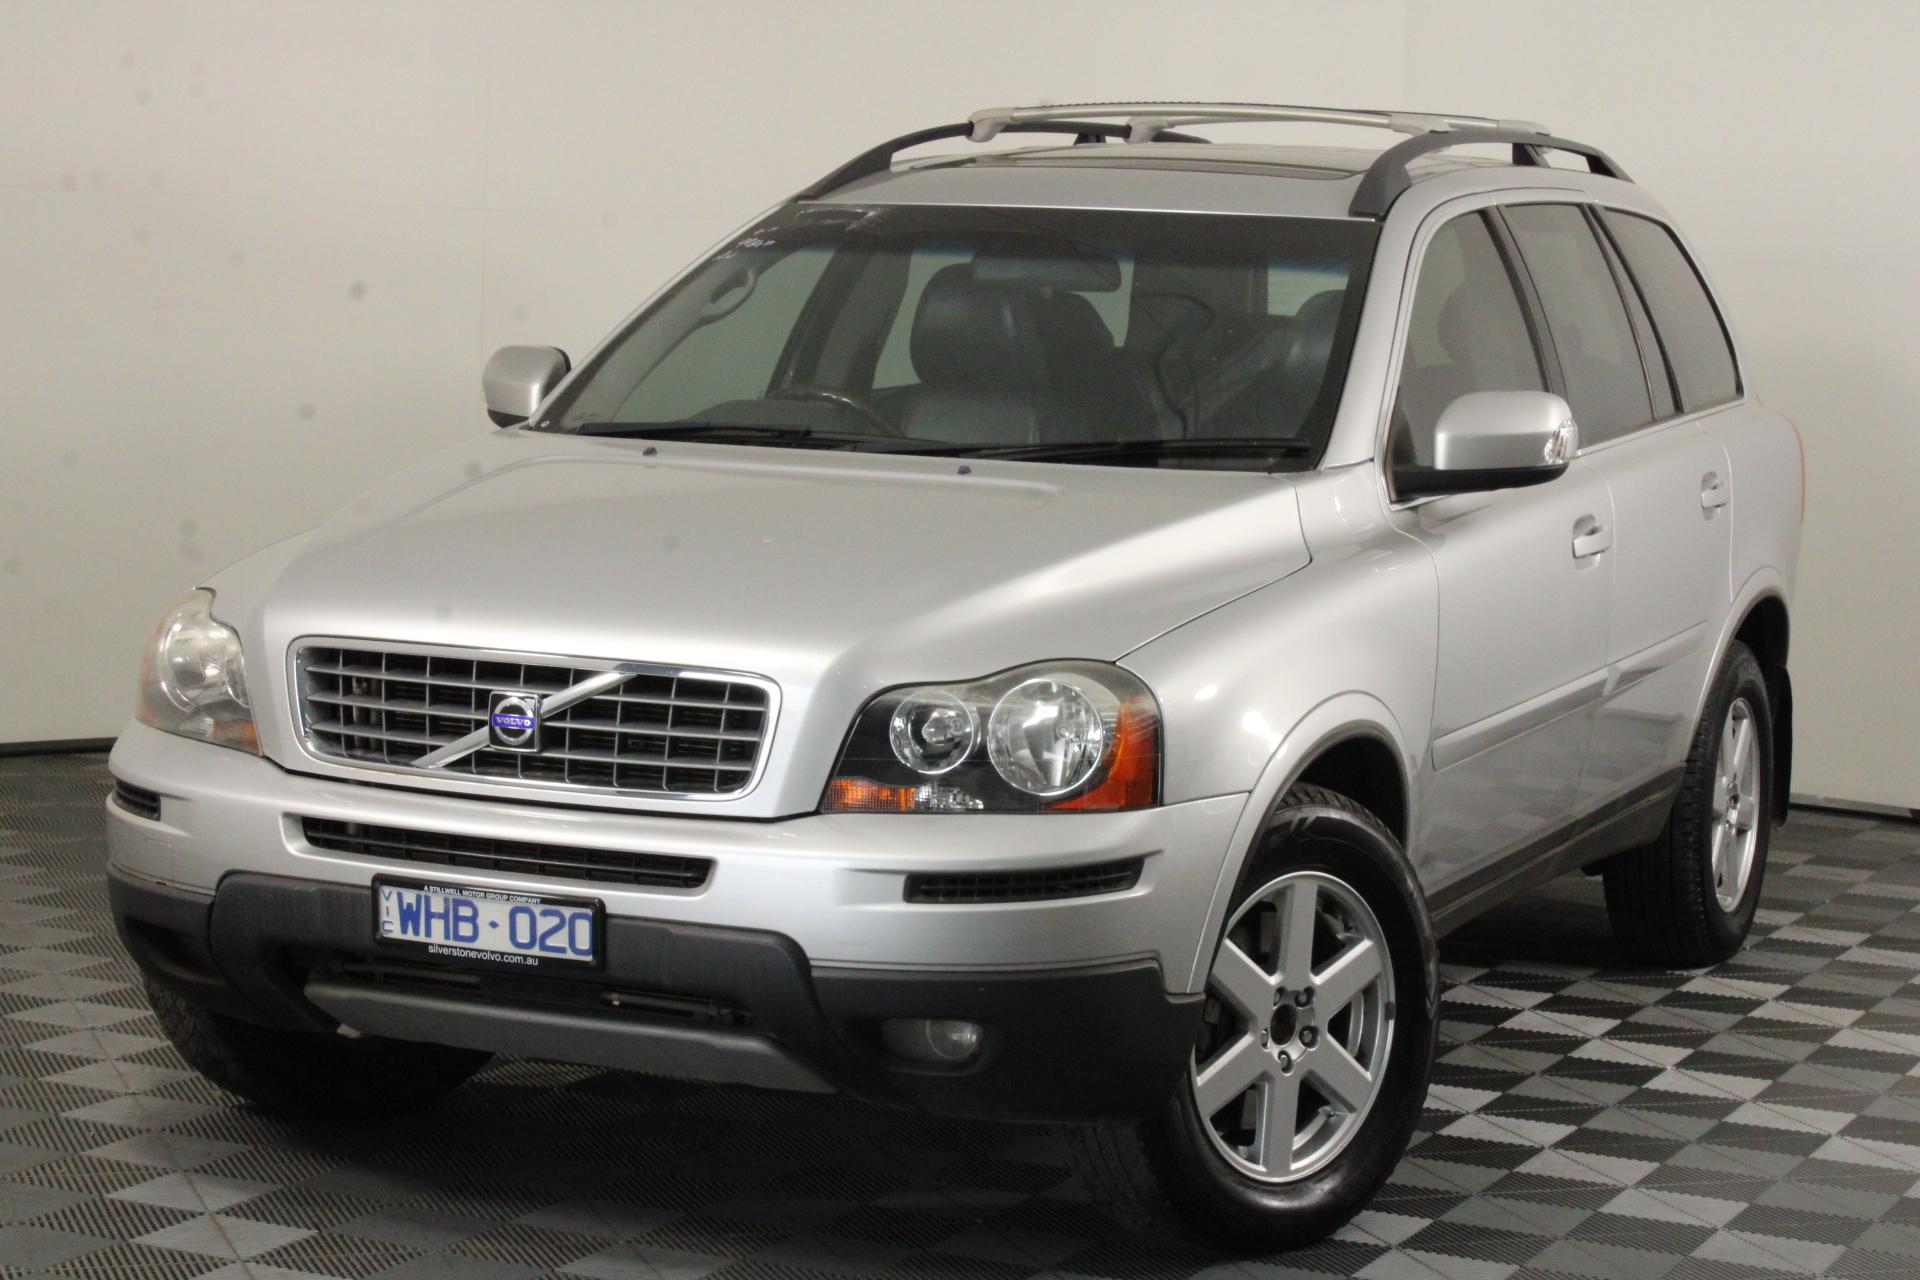 2007 Volvo XC90 D5 Turbo Diesel Automatic 7 Seats Wagon